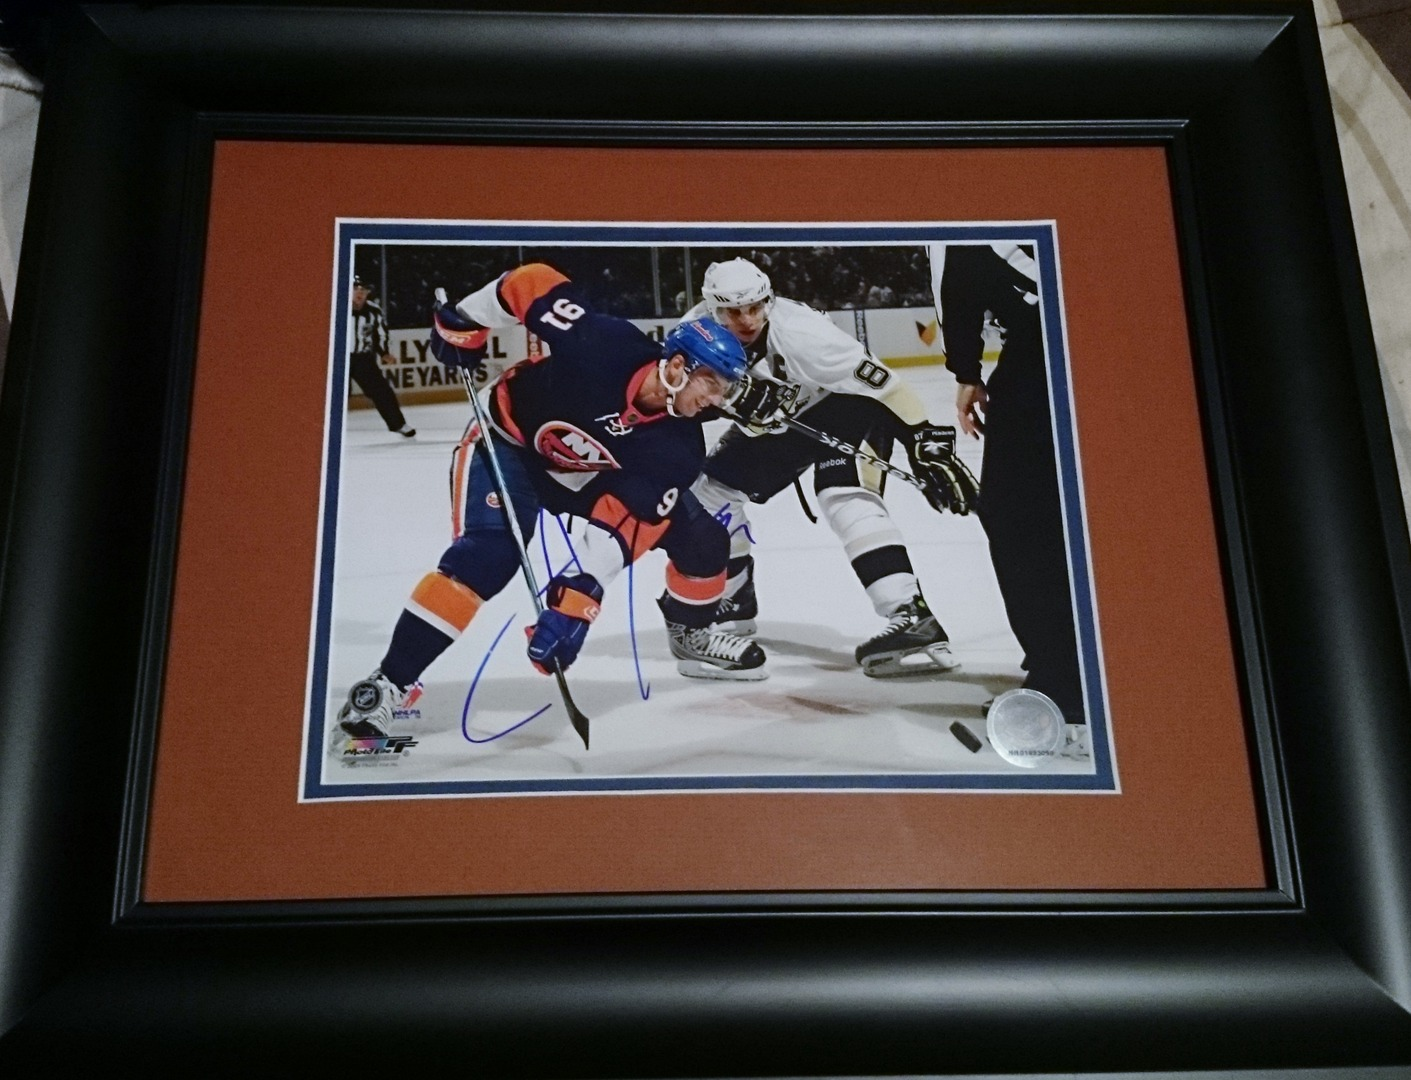 Decade Sports Memorabilia and Custom Framing